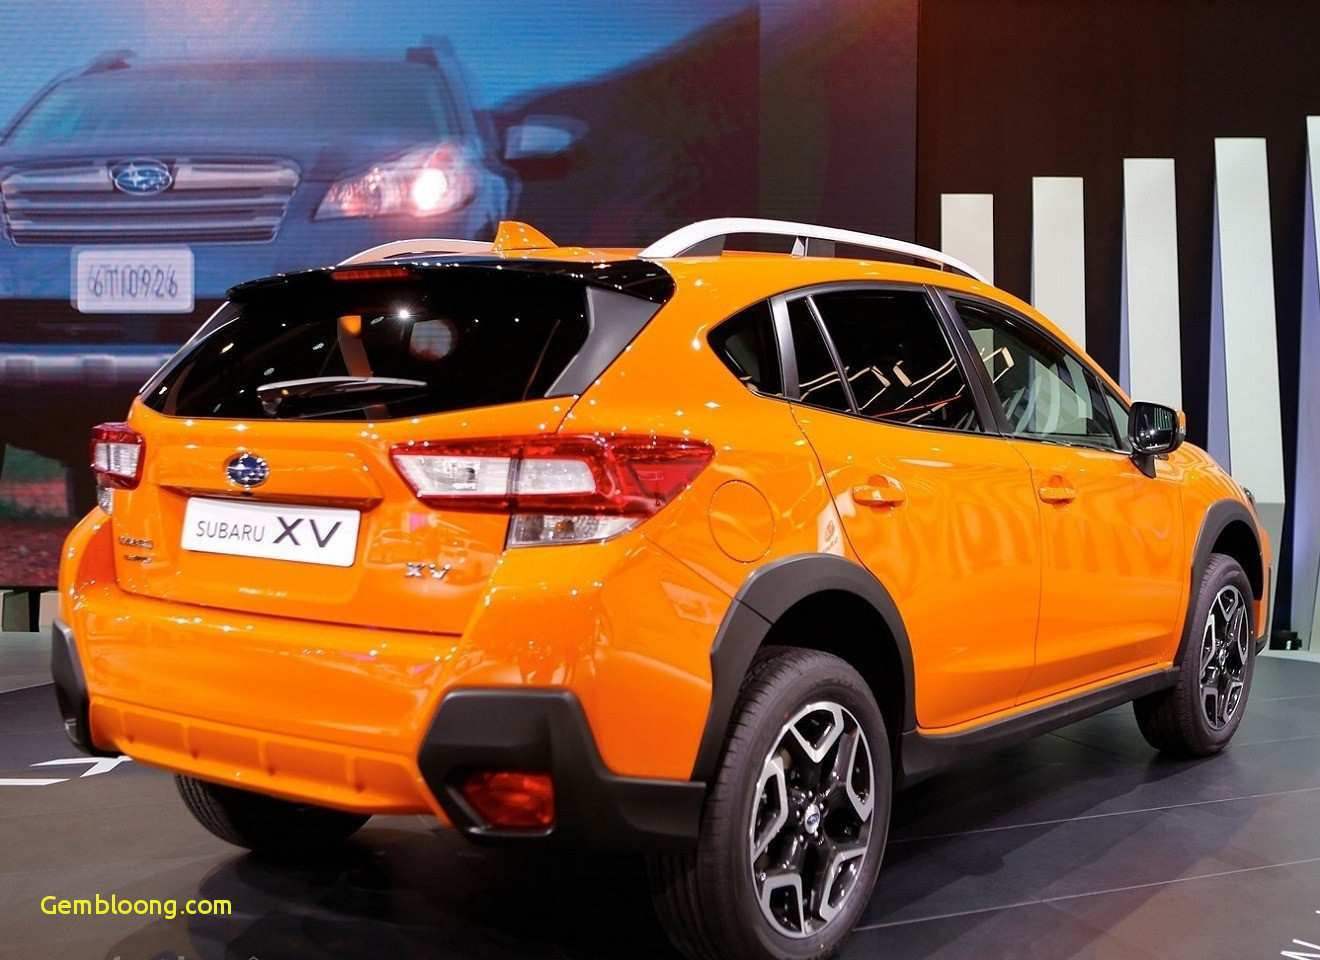 72 New Subaru Xv 2020 Australia History with Subaru Xv 2020 Australia